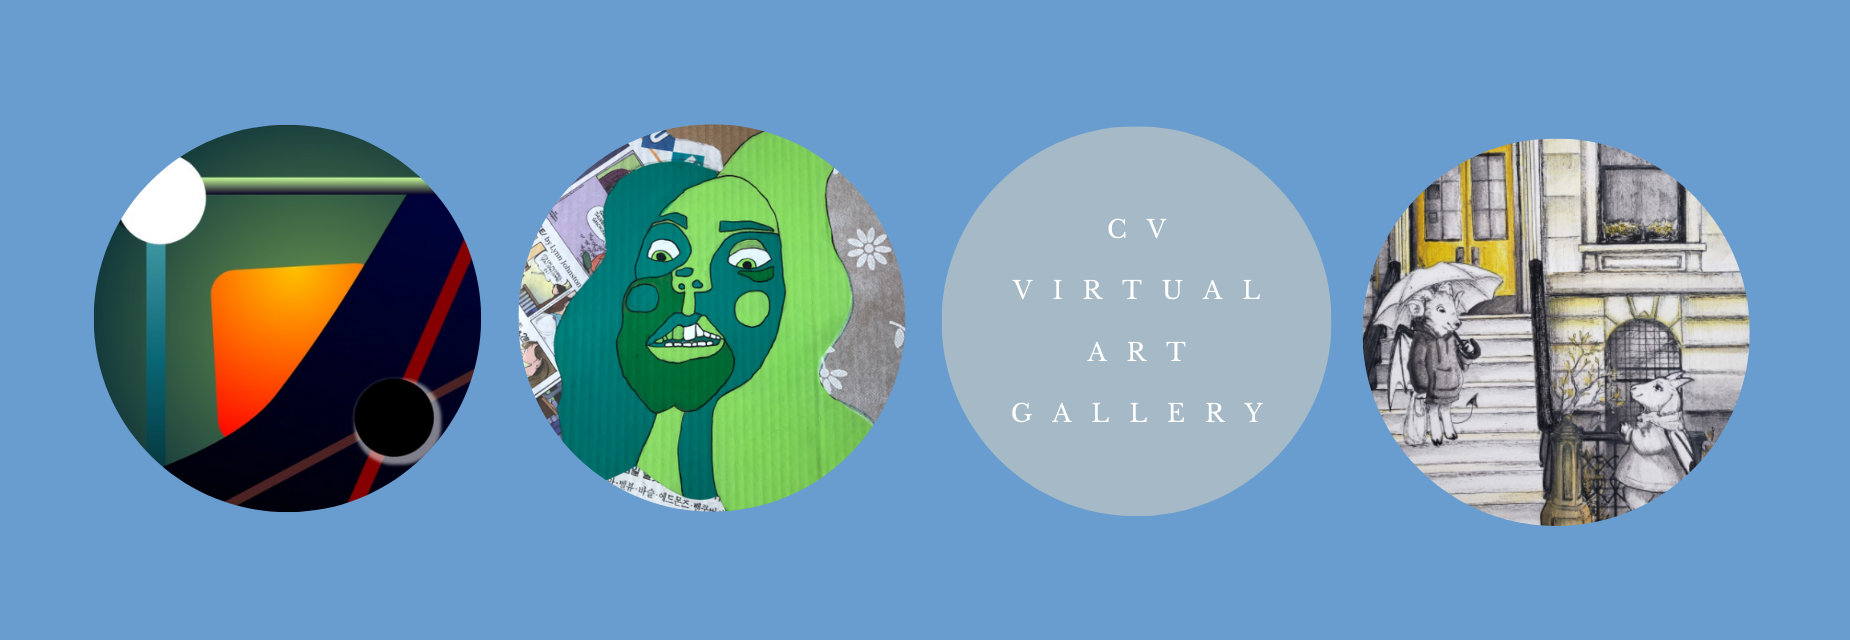 CV Virtual Art Gallery